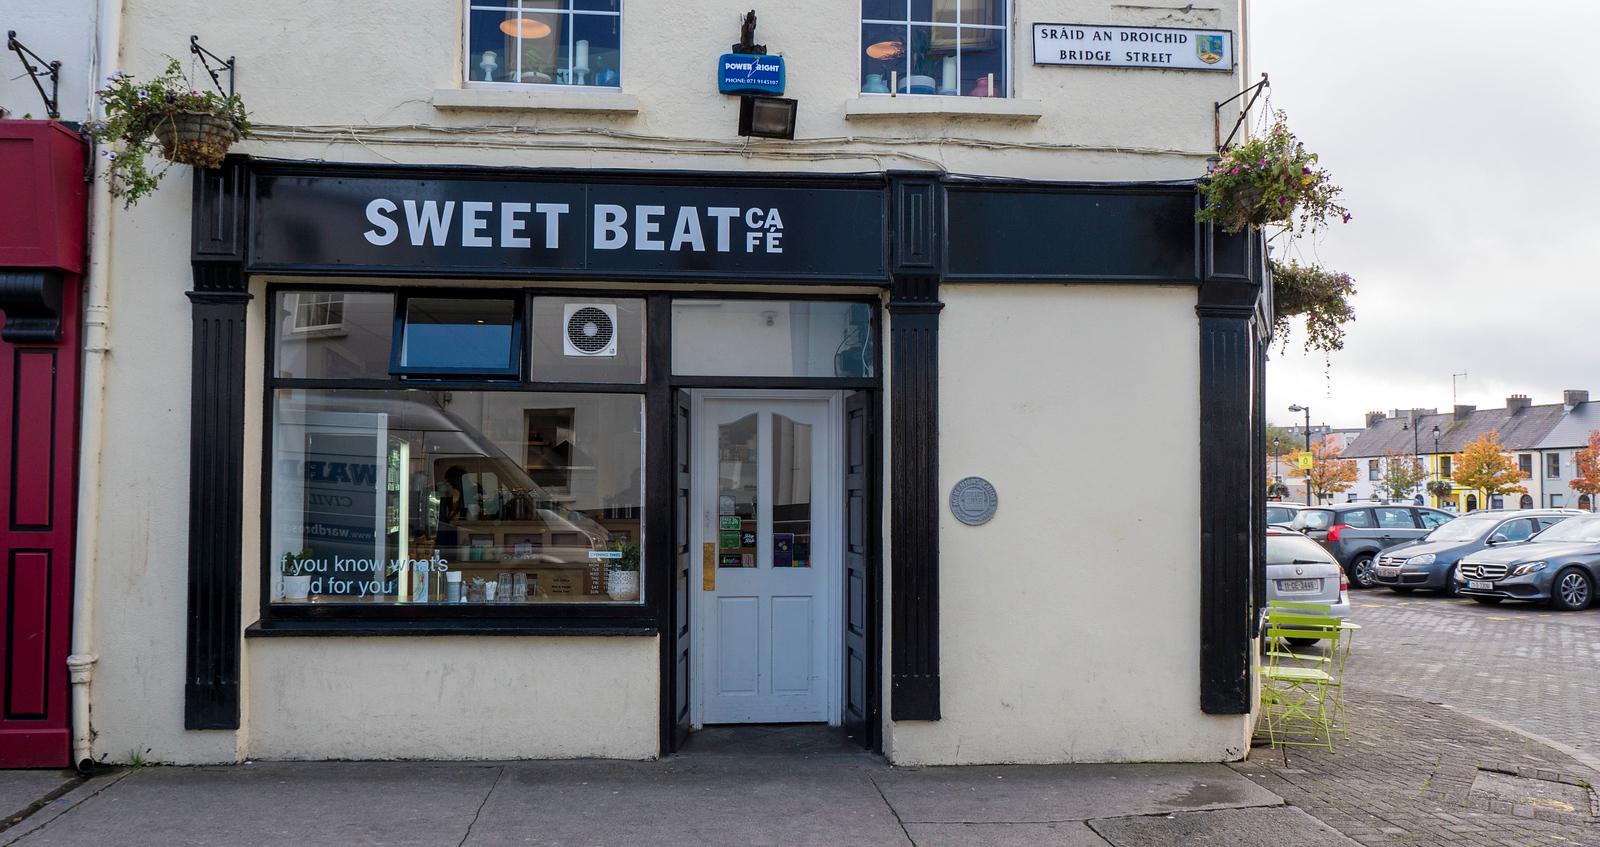 Things to Do in Sligo Ireland - One Day in Sligo